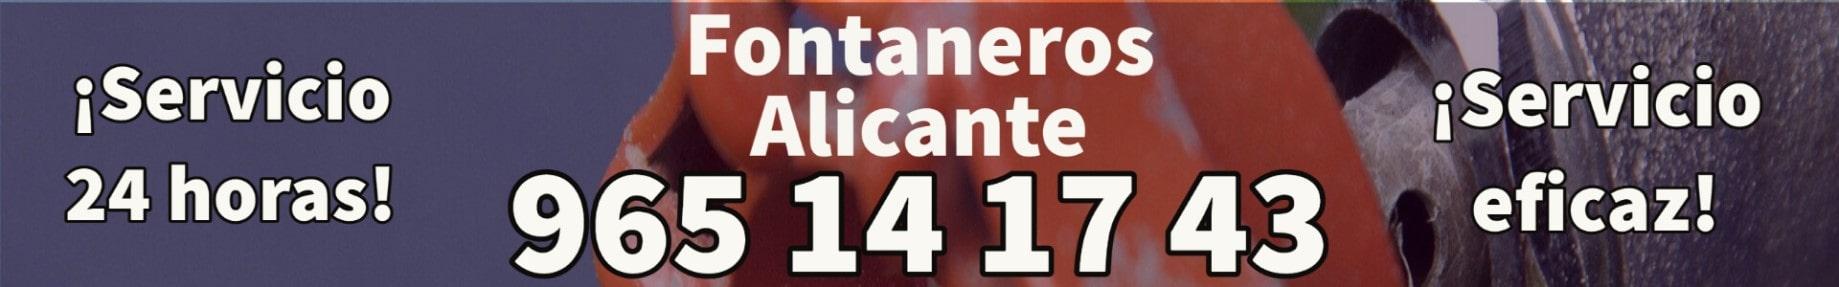 Fontaneros Alicante